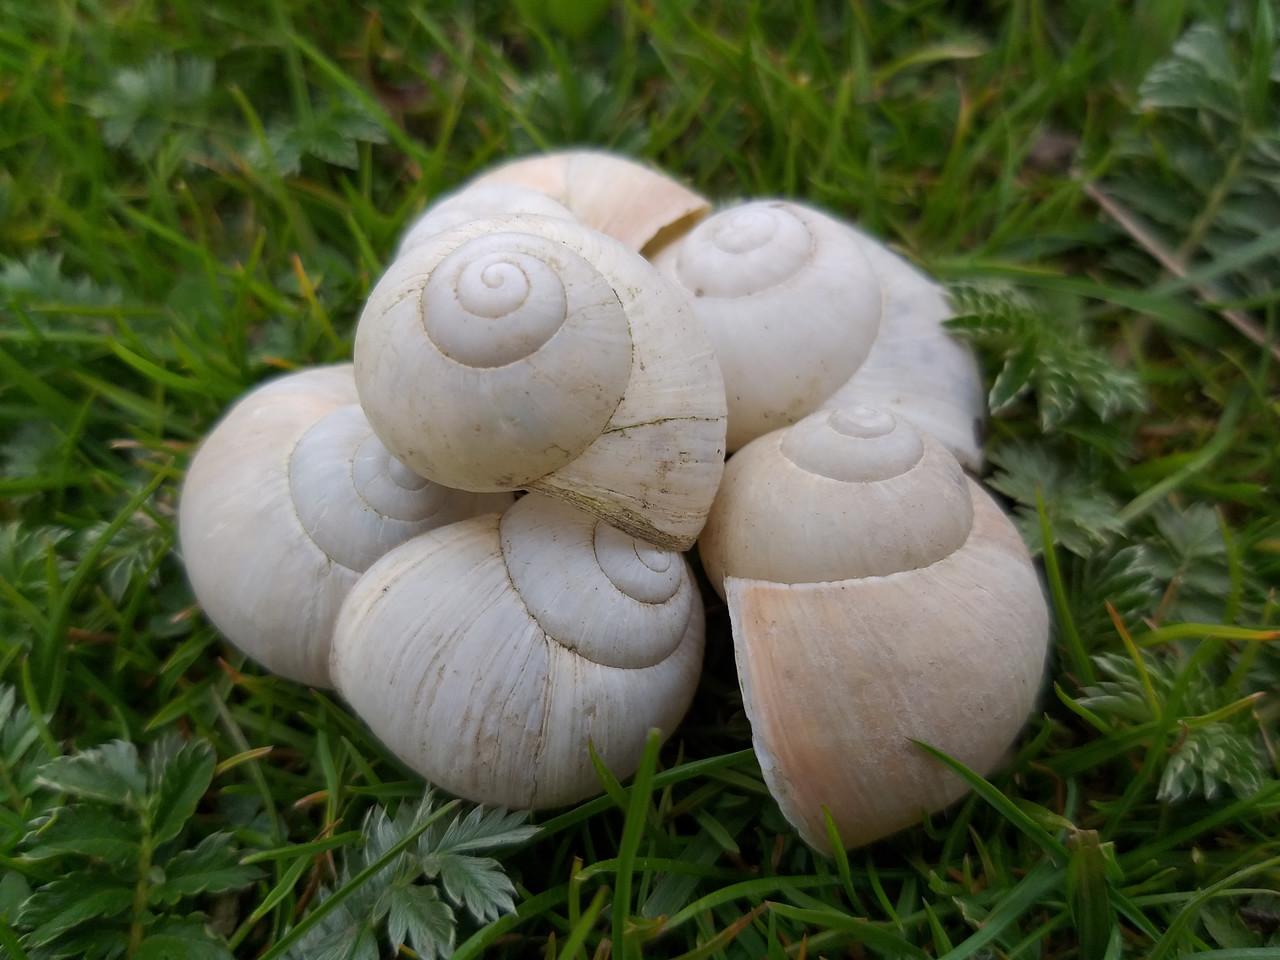 Ракушки белой улитки для декора, 10 шт\уп., 10 грн